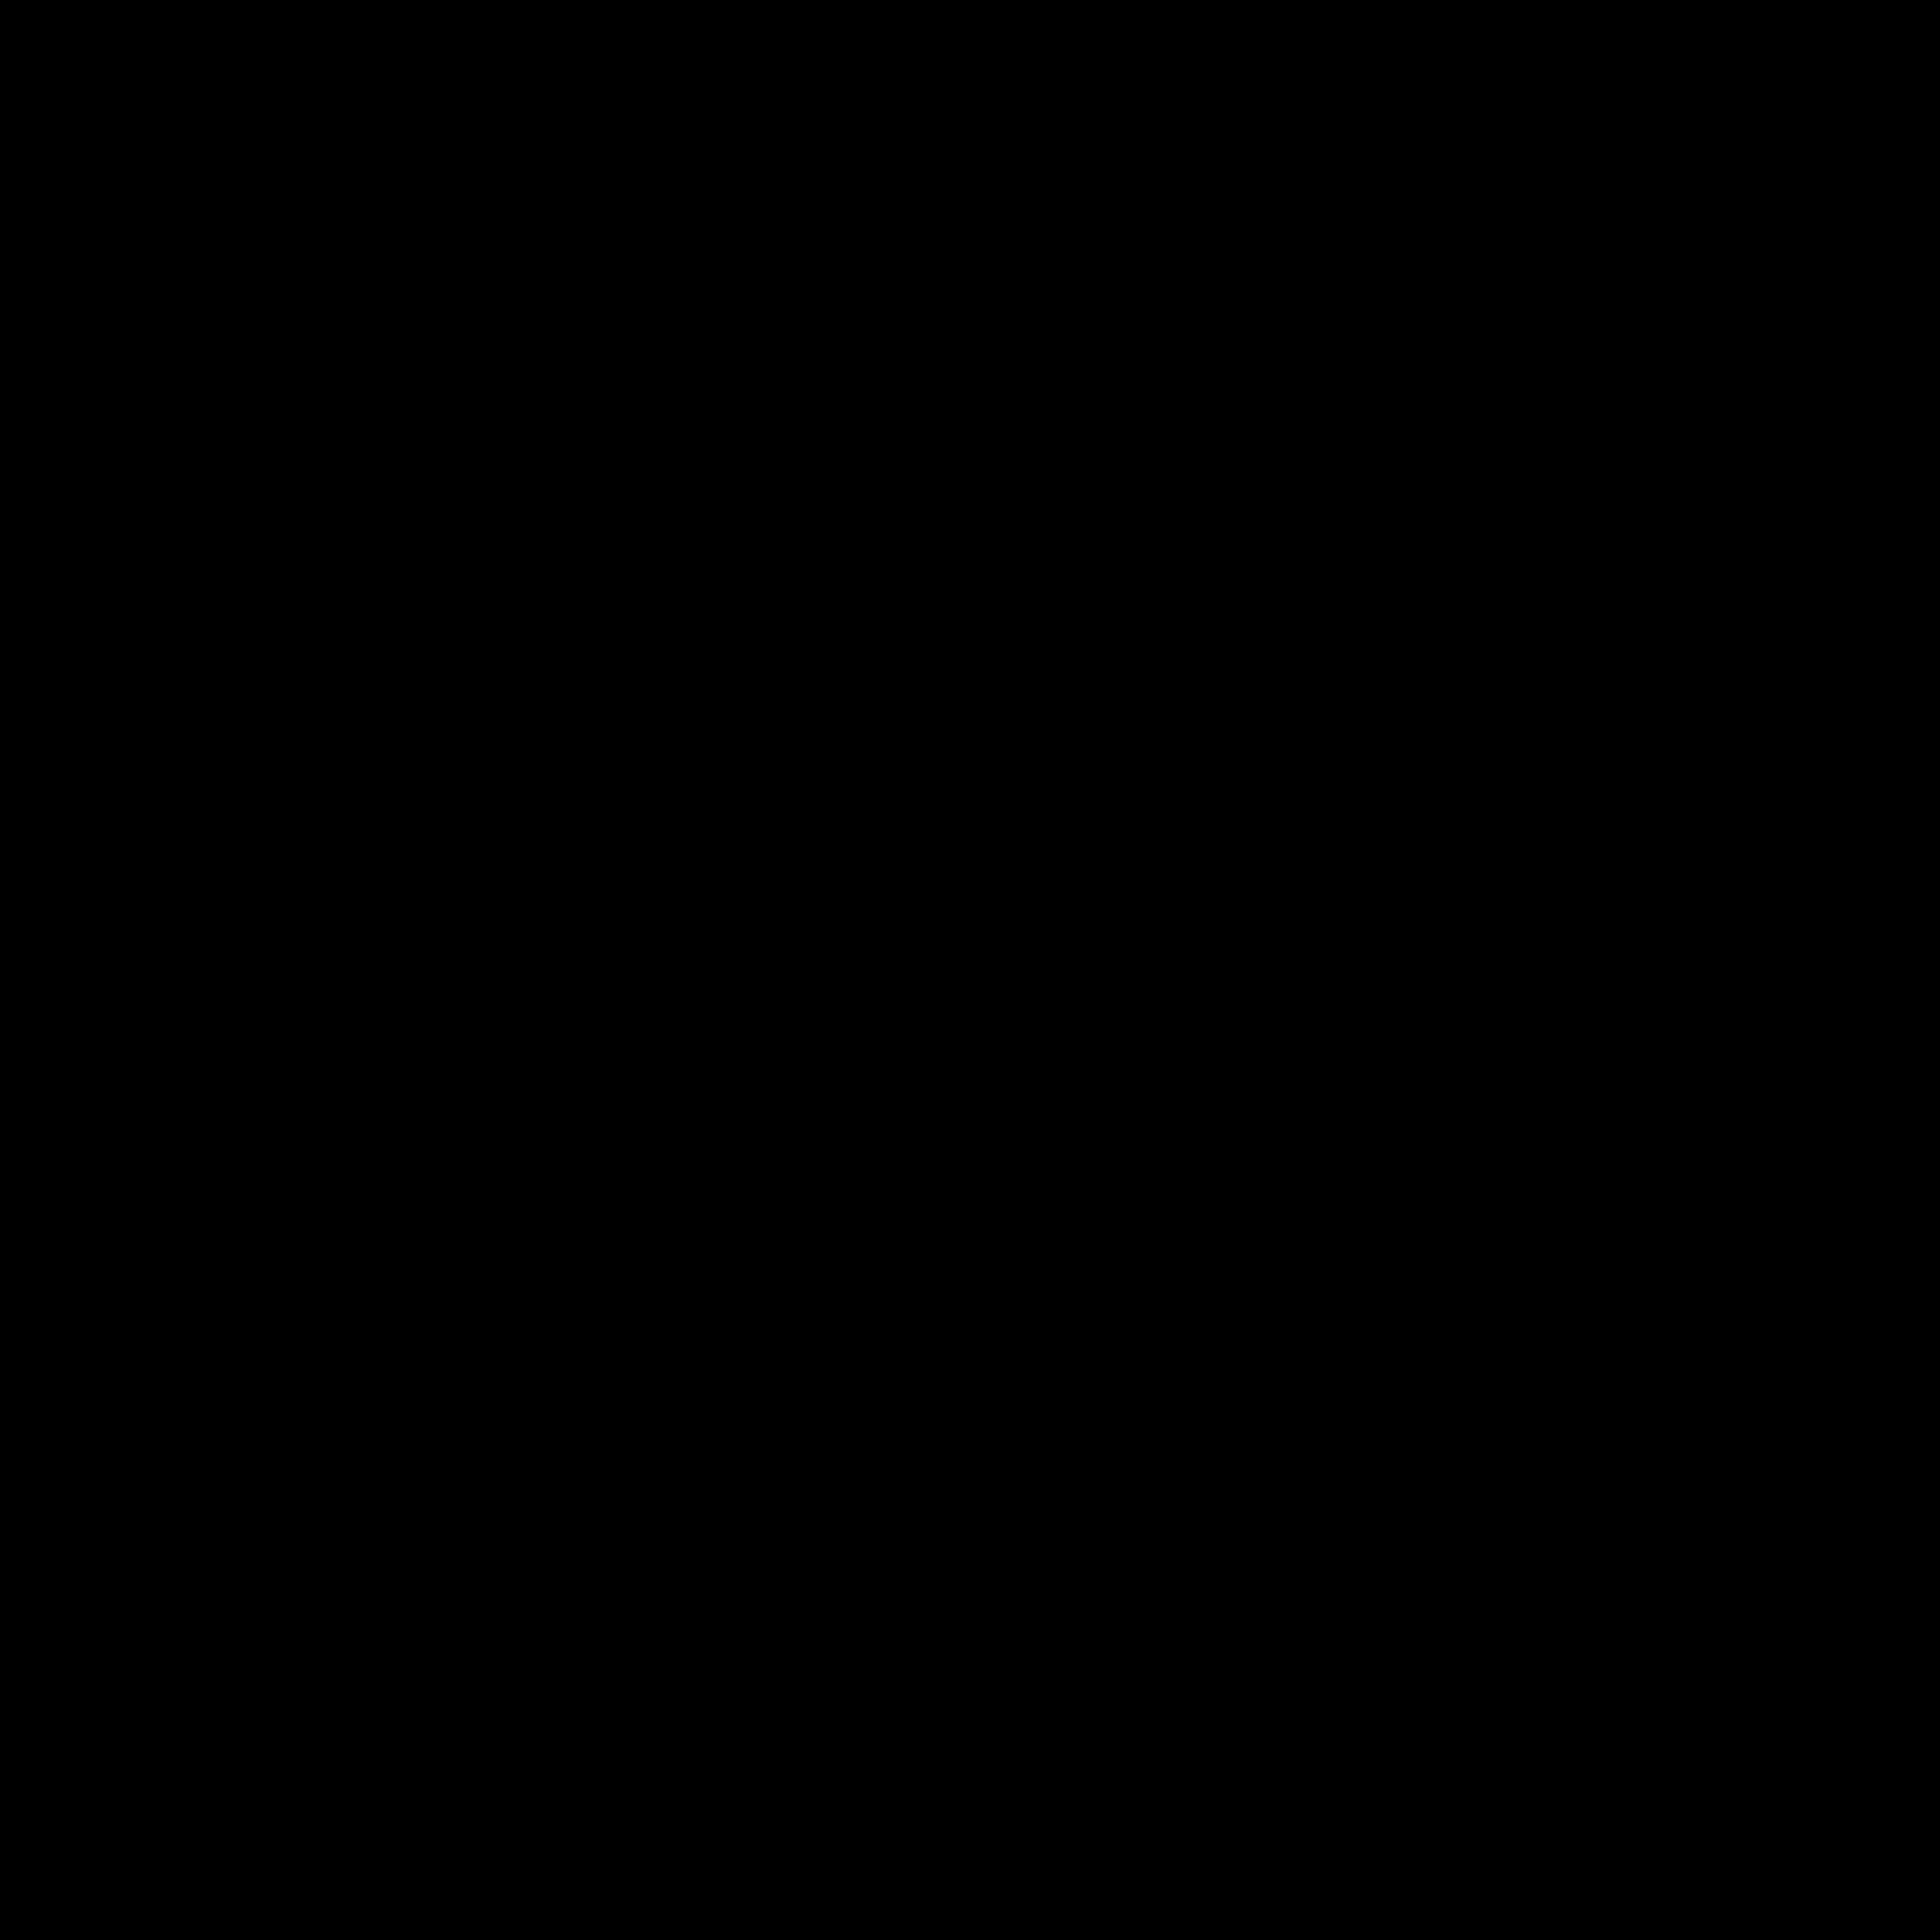 Naklejka na ścianę jaskółka